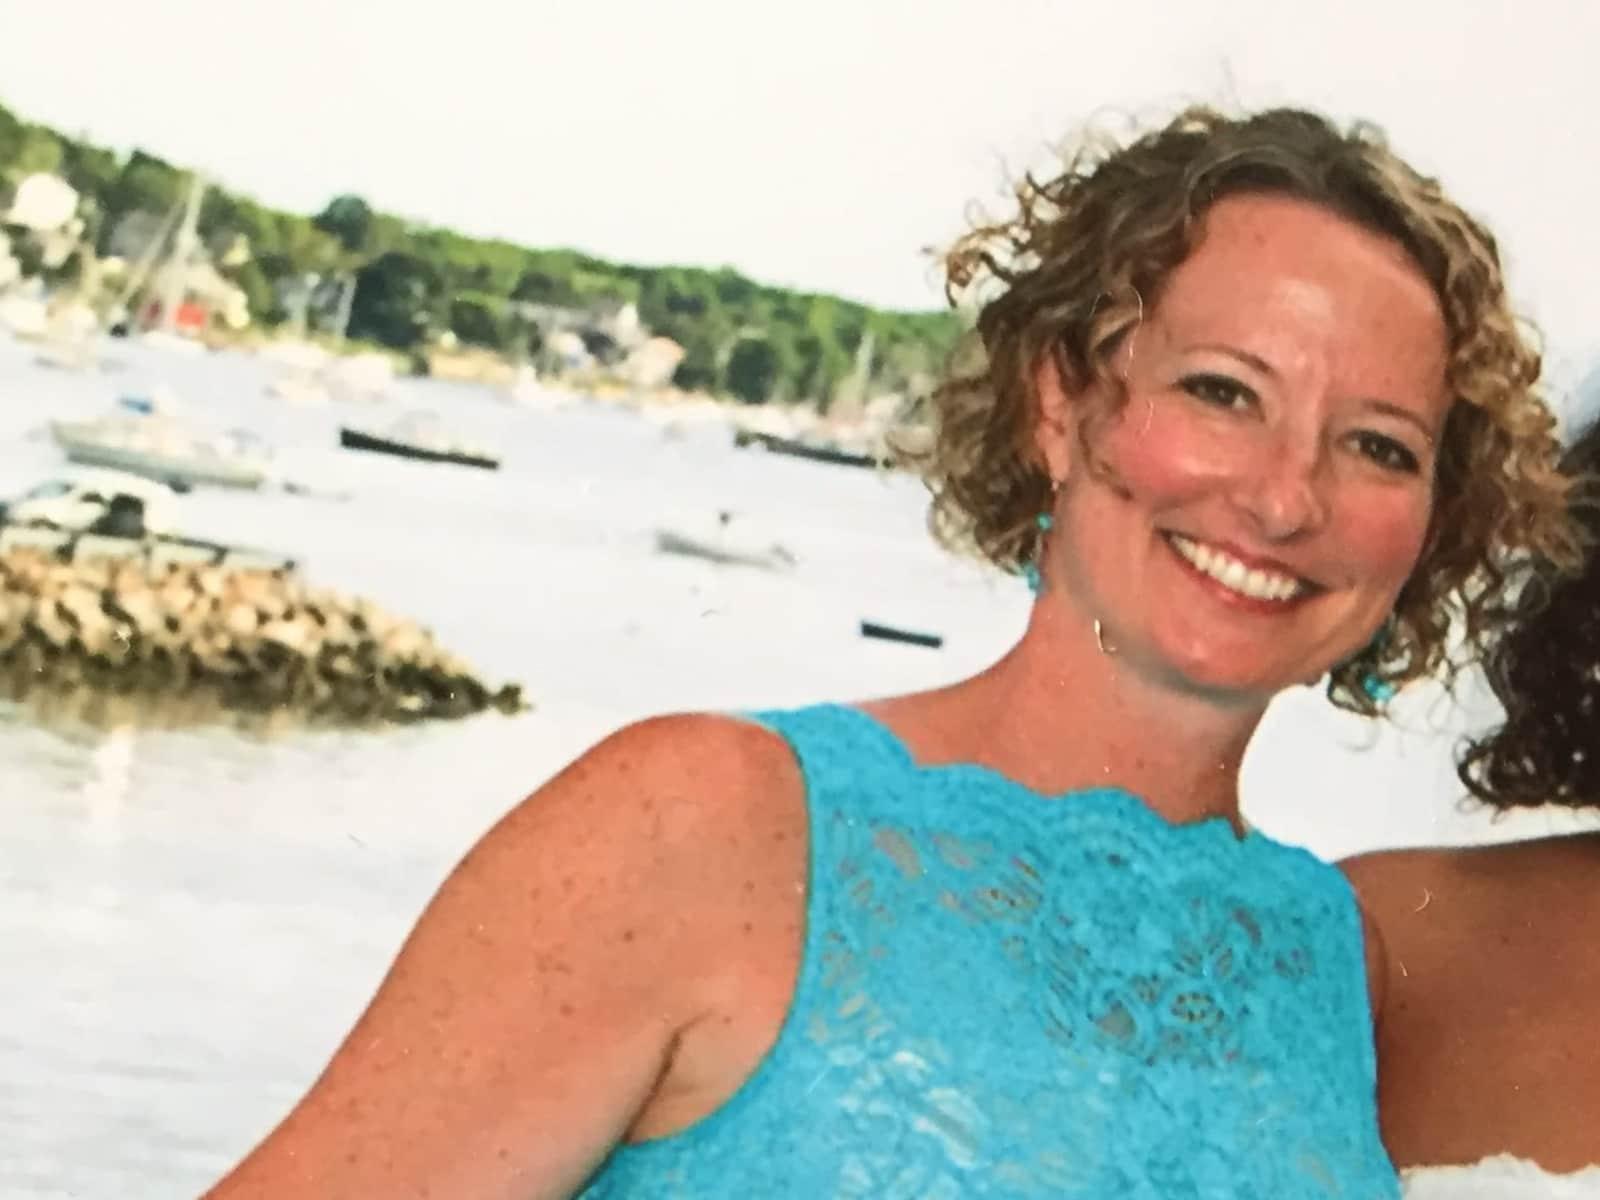 Denise from Boston, Massachusetts, United States